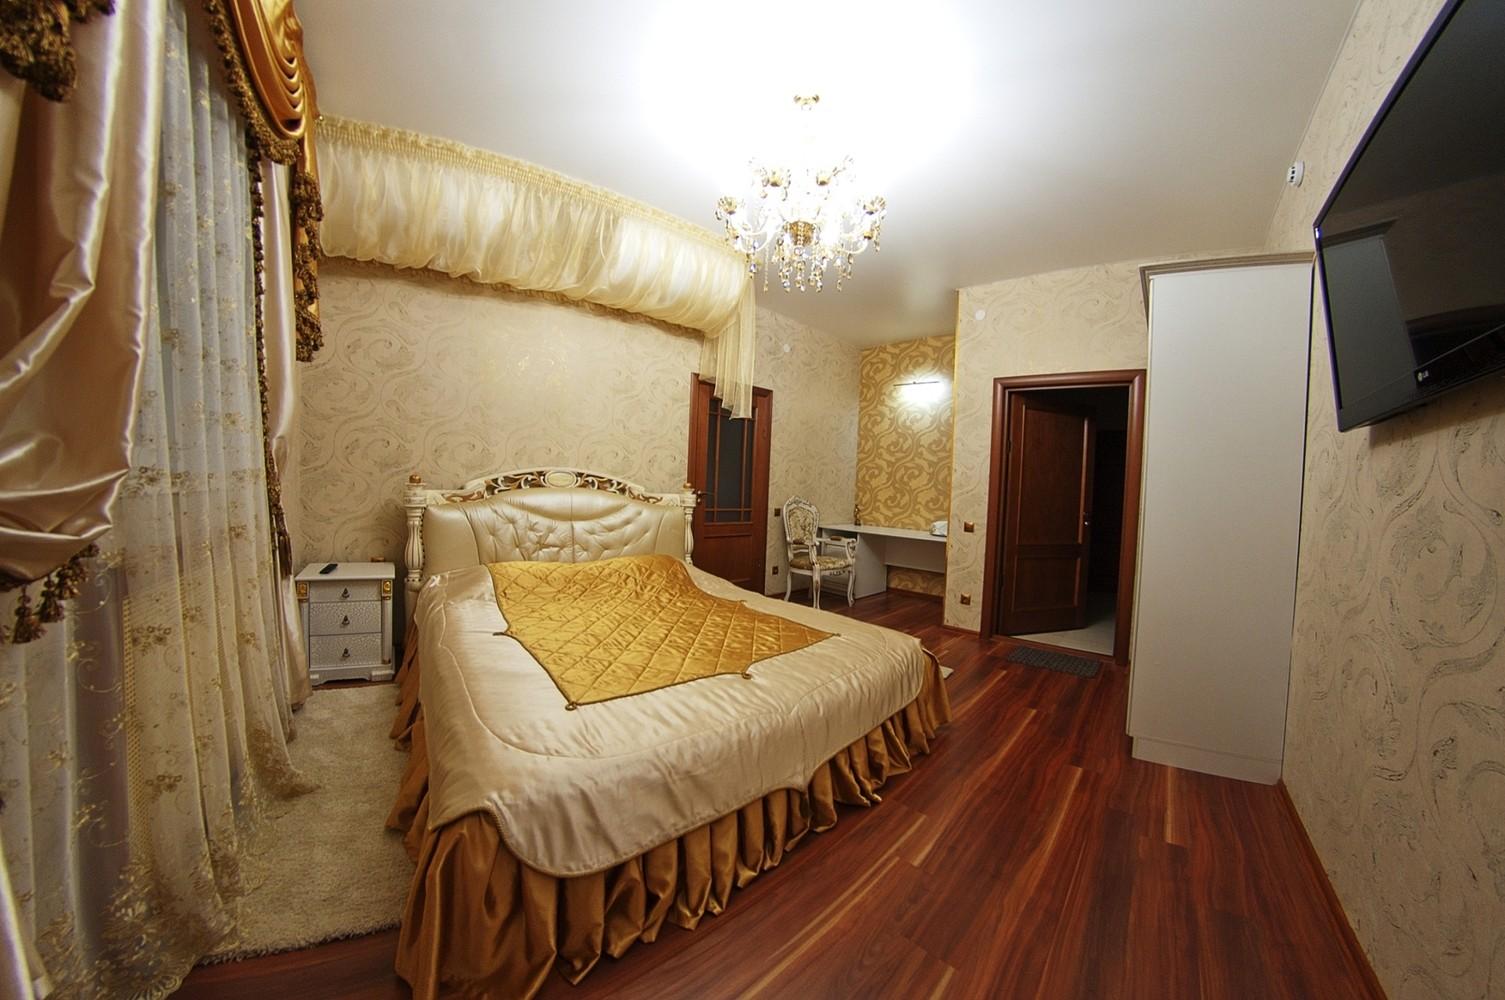 Москвич, гостевой дом - №23